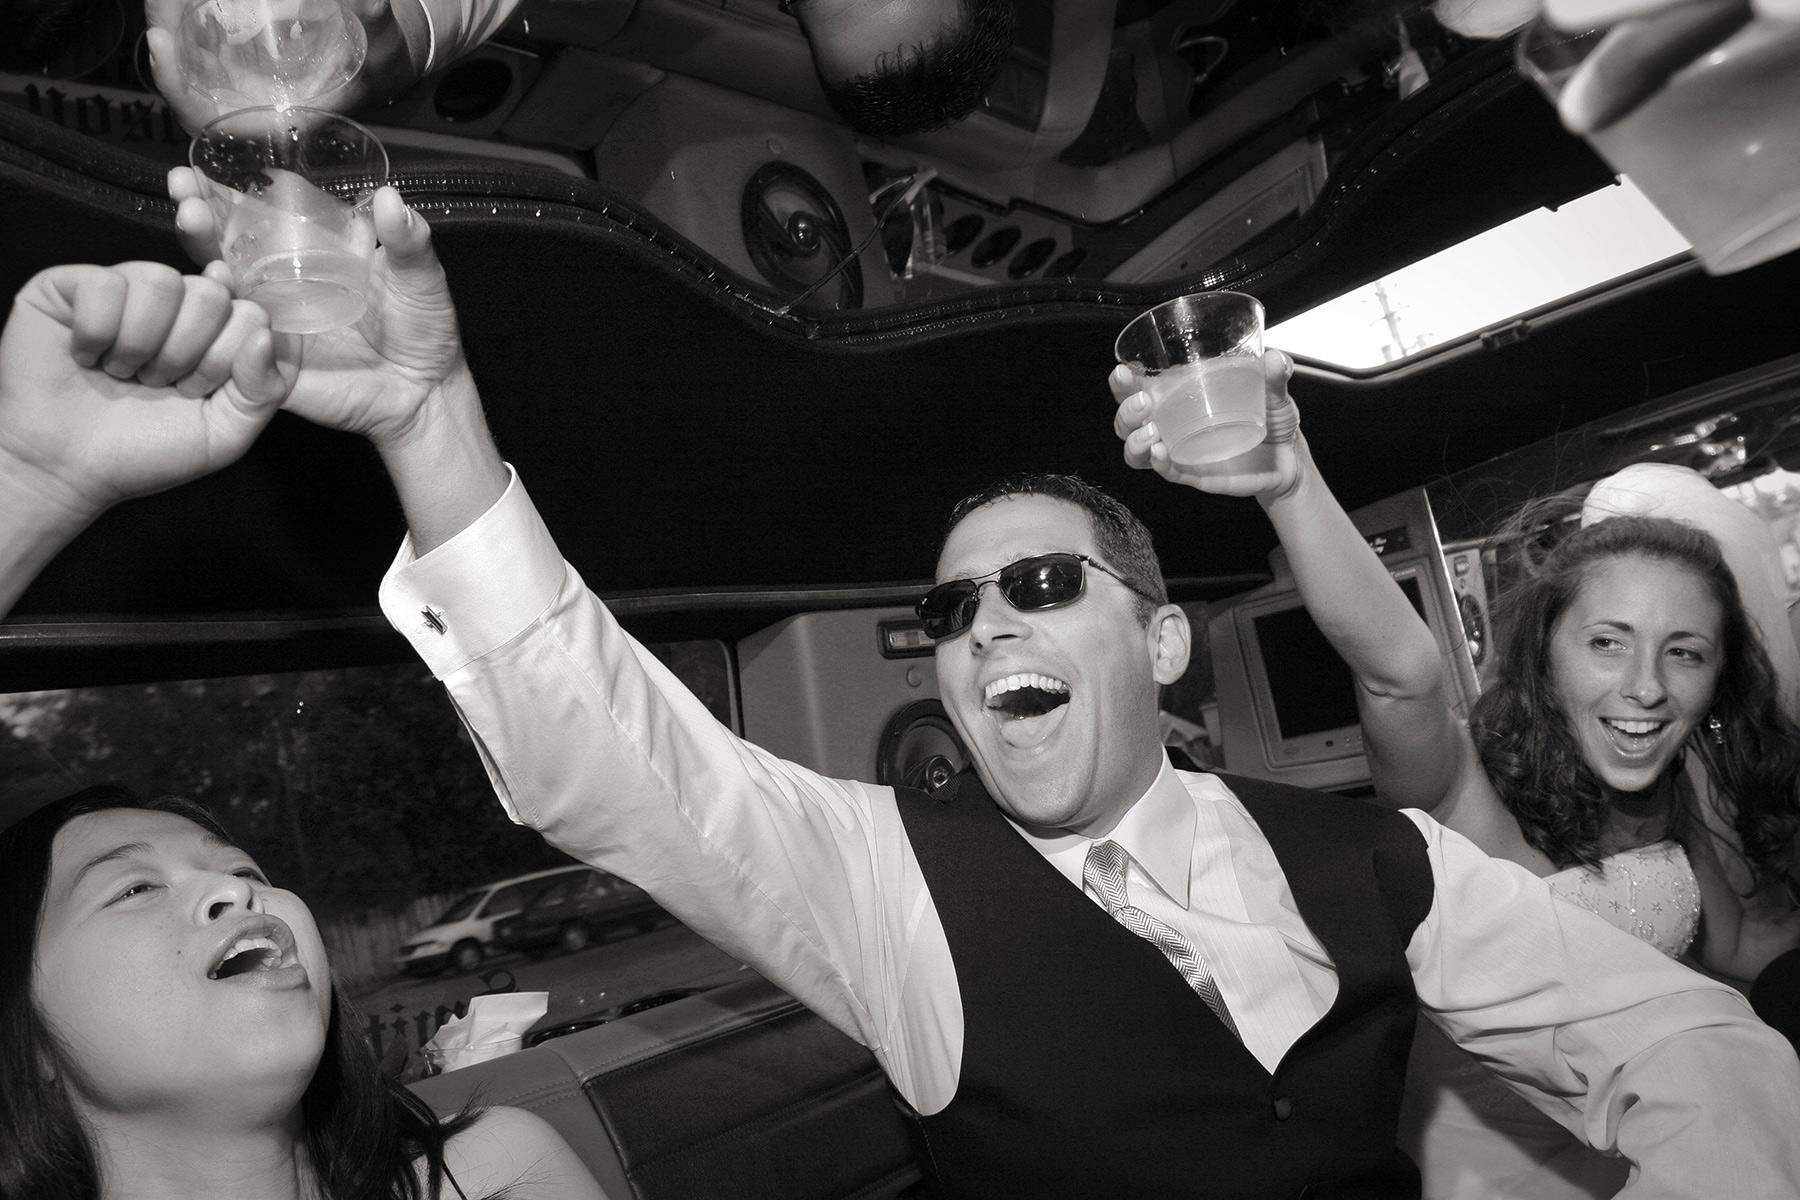 wedding-photography-saint-paul-mark-kegans-655.jpg